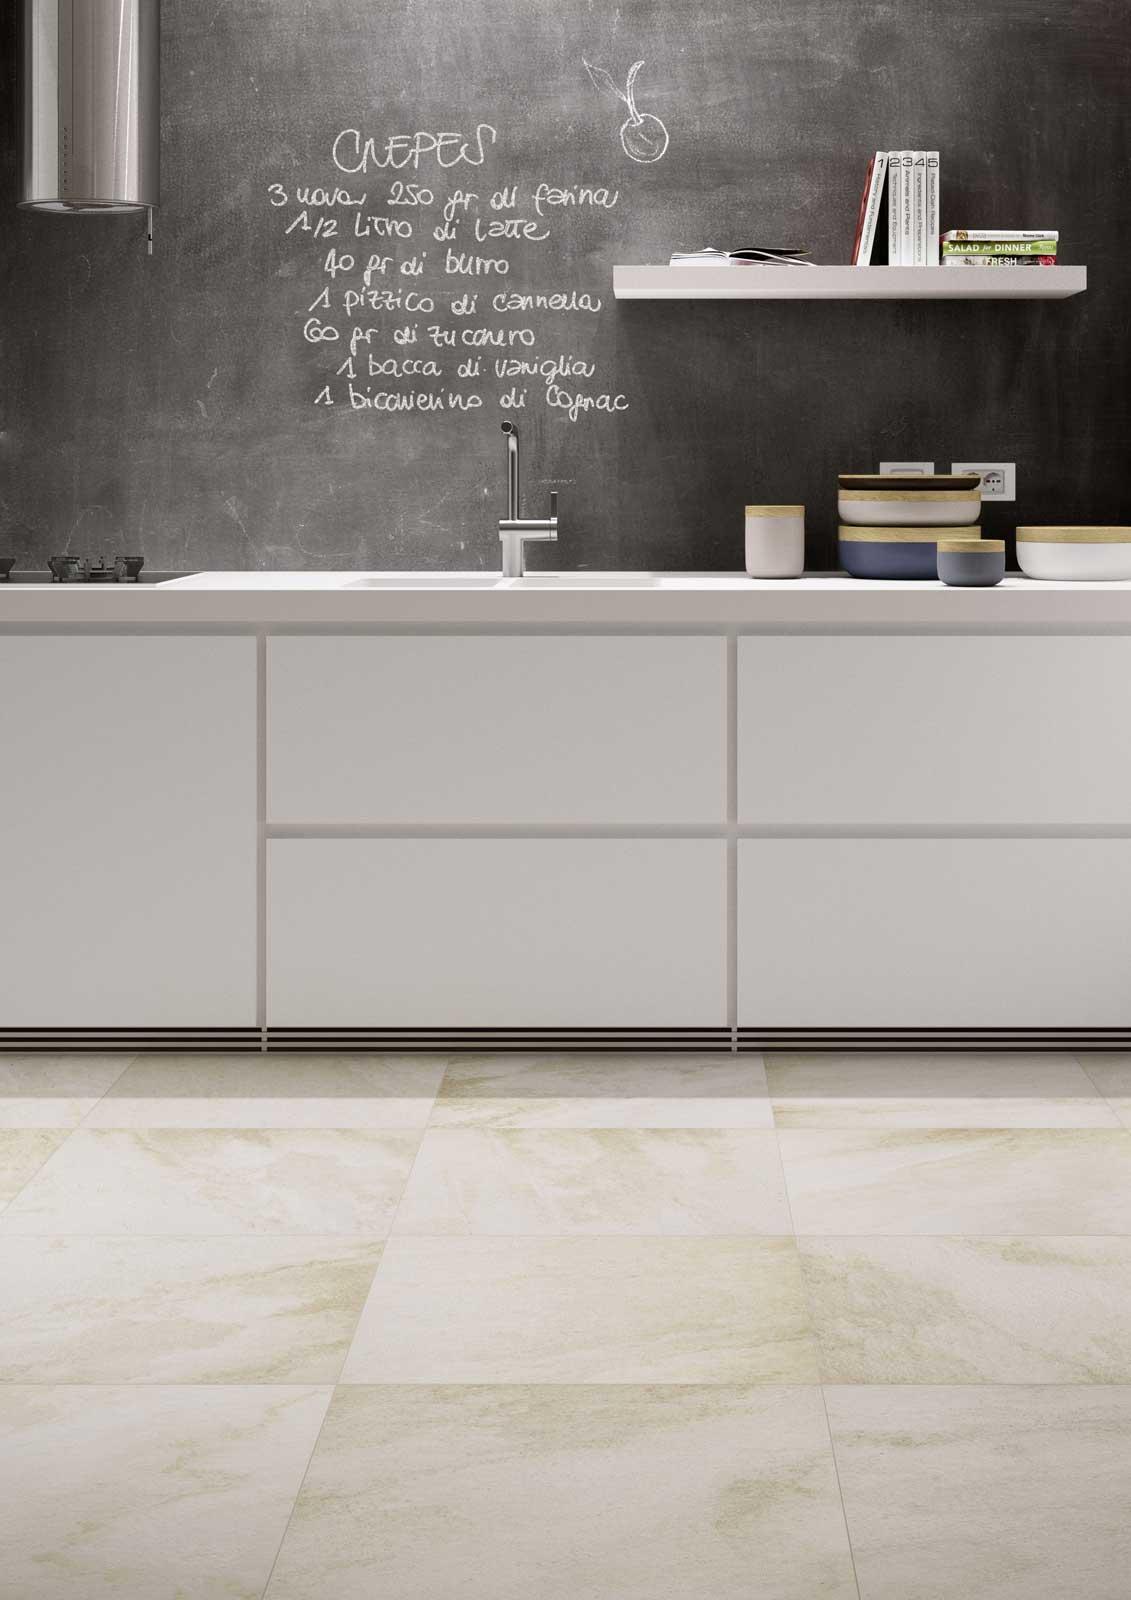 Adesivi murali cucina mattoni - Adesivi per piastrelle cucina ...